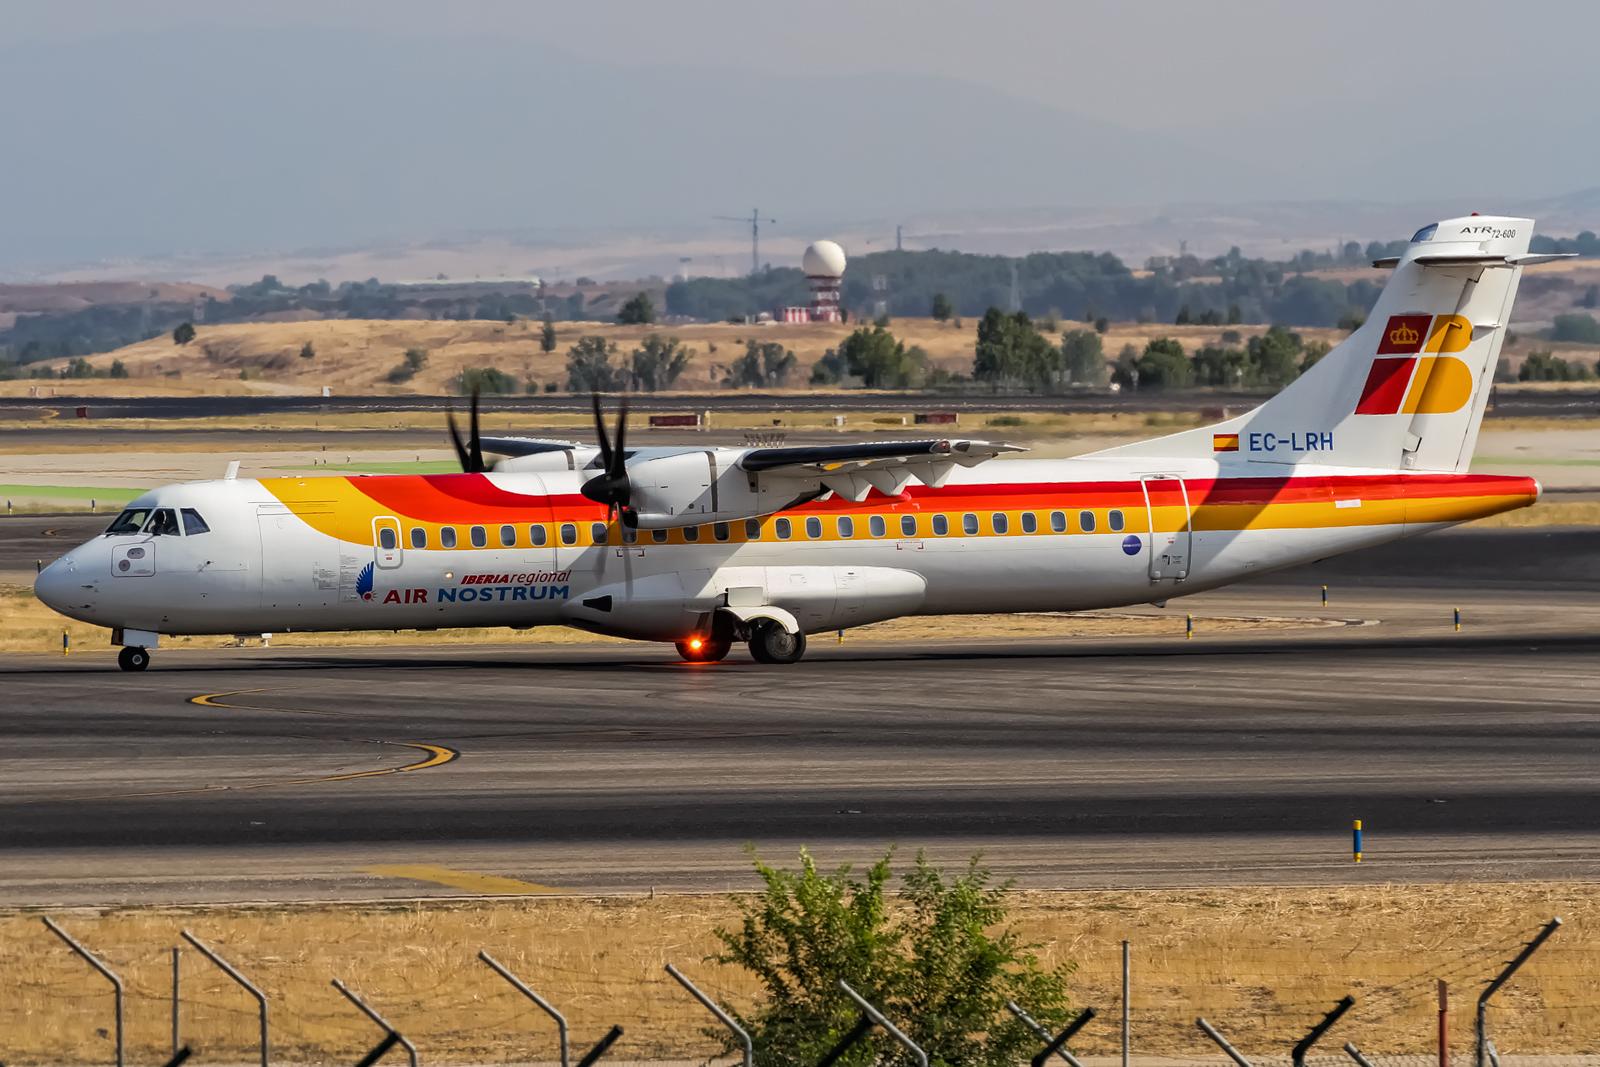 File:Air Nostrum ATR 72-600 (EC-LRH) at Madrid Barajas Airpo